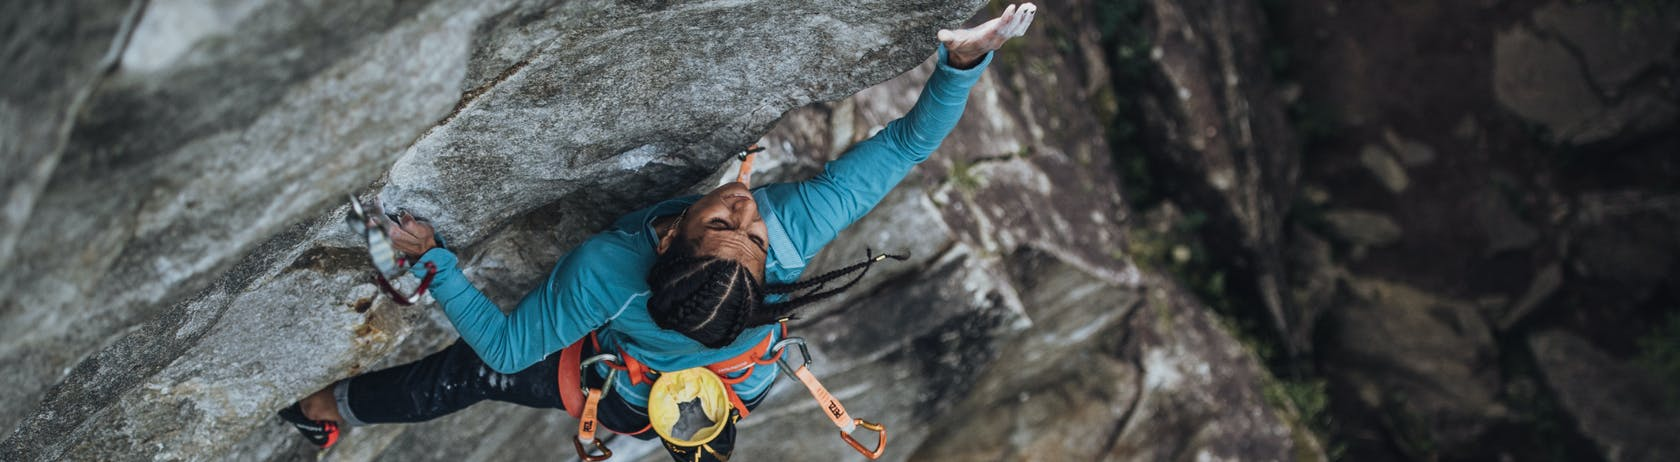 La Sportiva Shop Online Arrampicata Bouldering